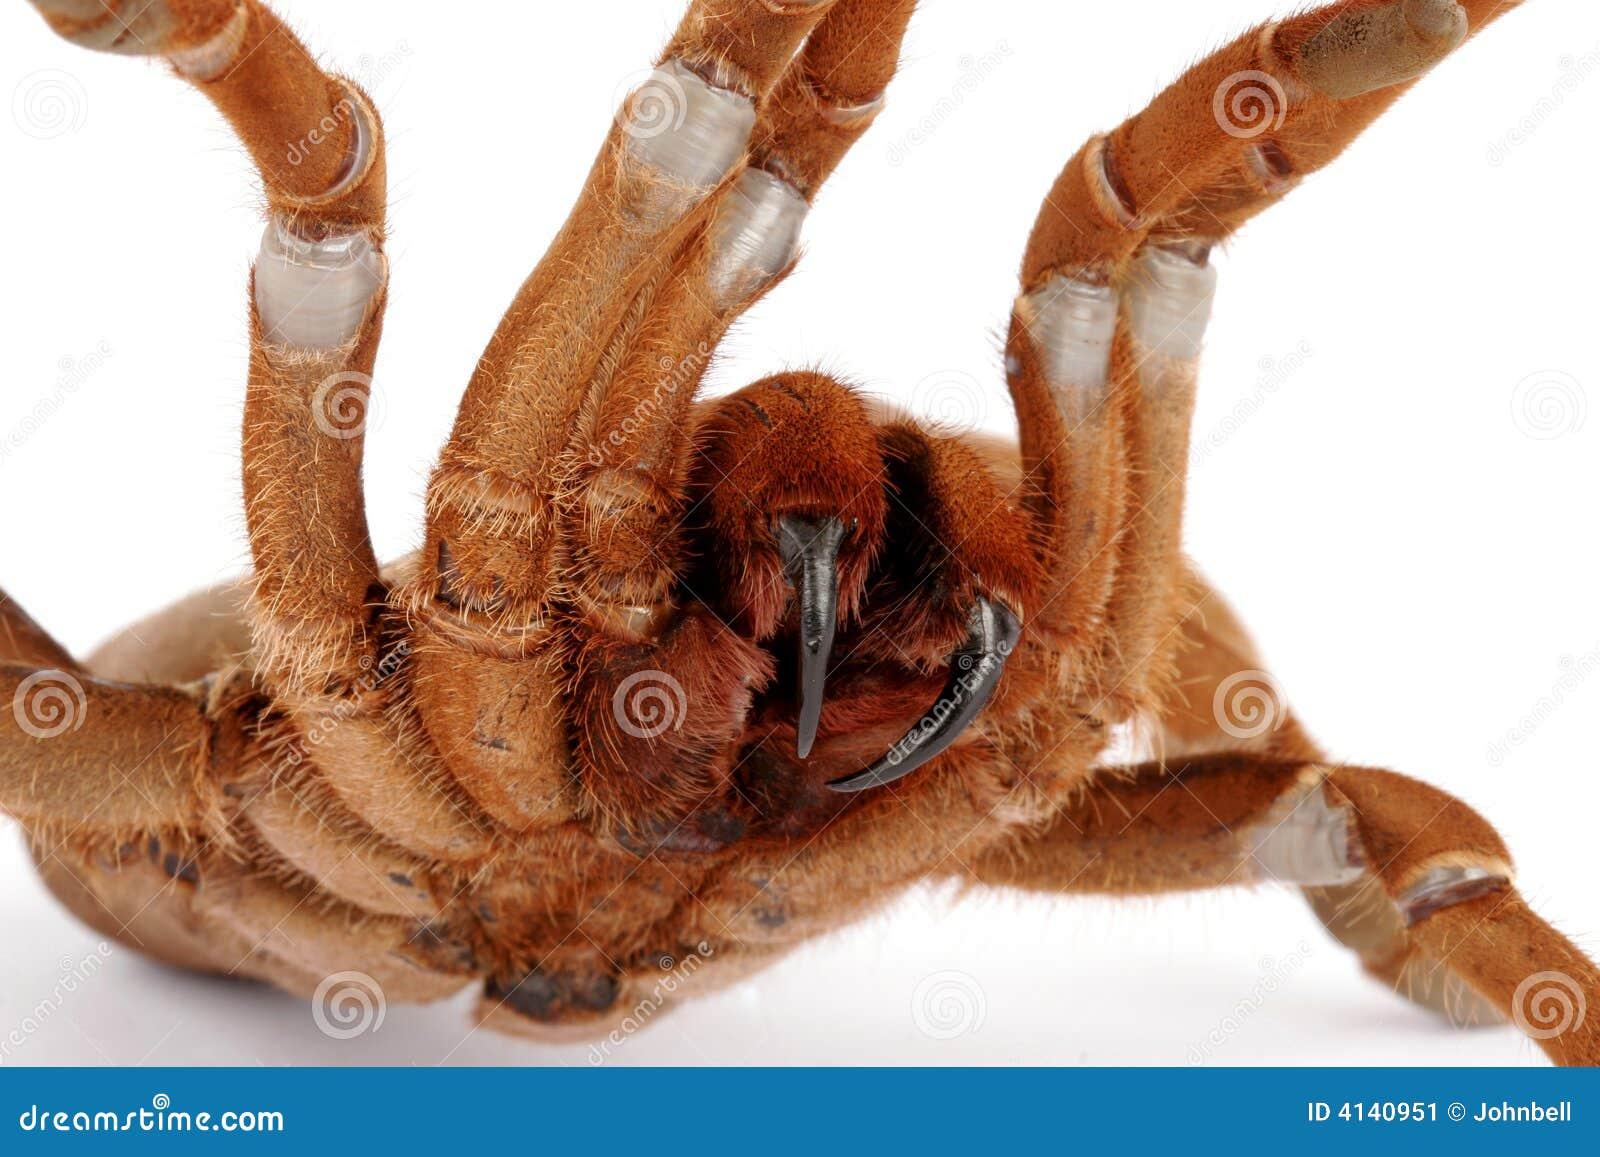 König Baboon Tarantula (Citharischius crawshayi)